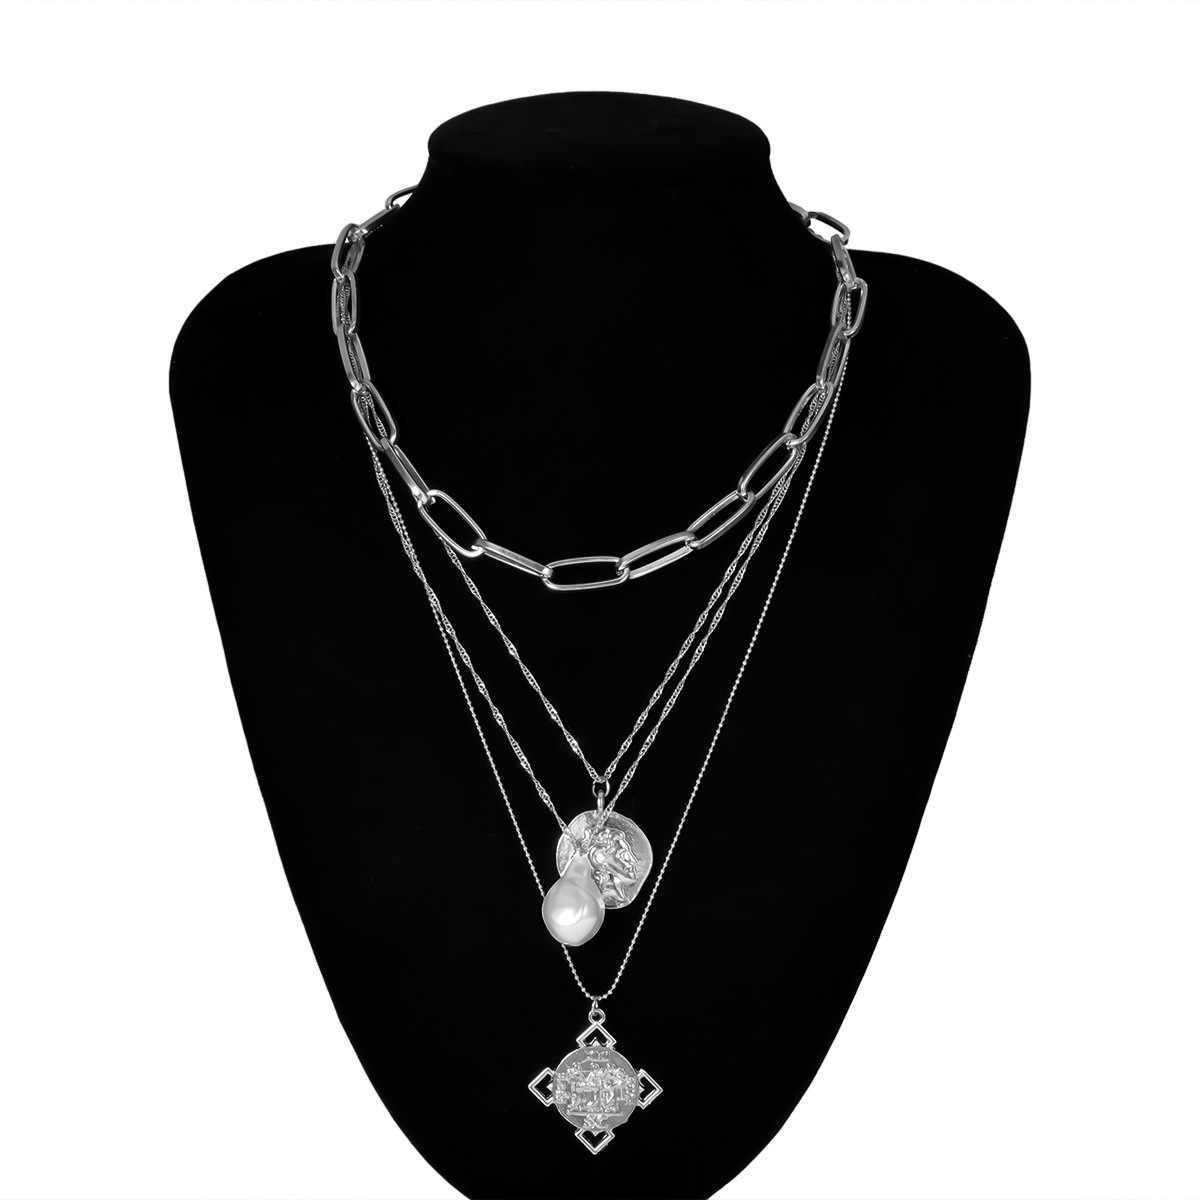 Boho חרוזים אופנה רב שכבה זהב צבע ארוך קונכייה תליוני שרשרת נשים הצהרת פרל אוקיינוס צדף חוף תכשיטים